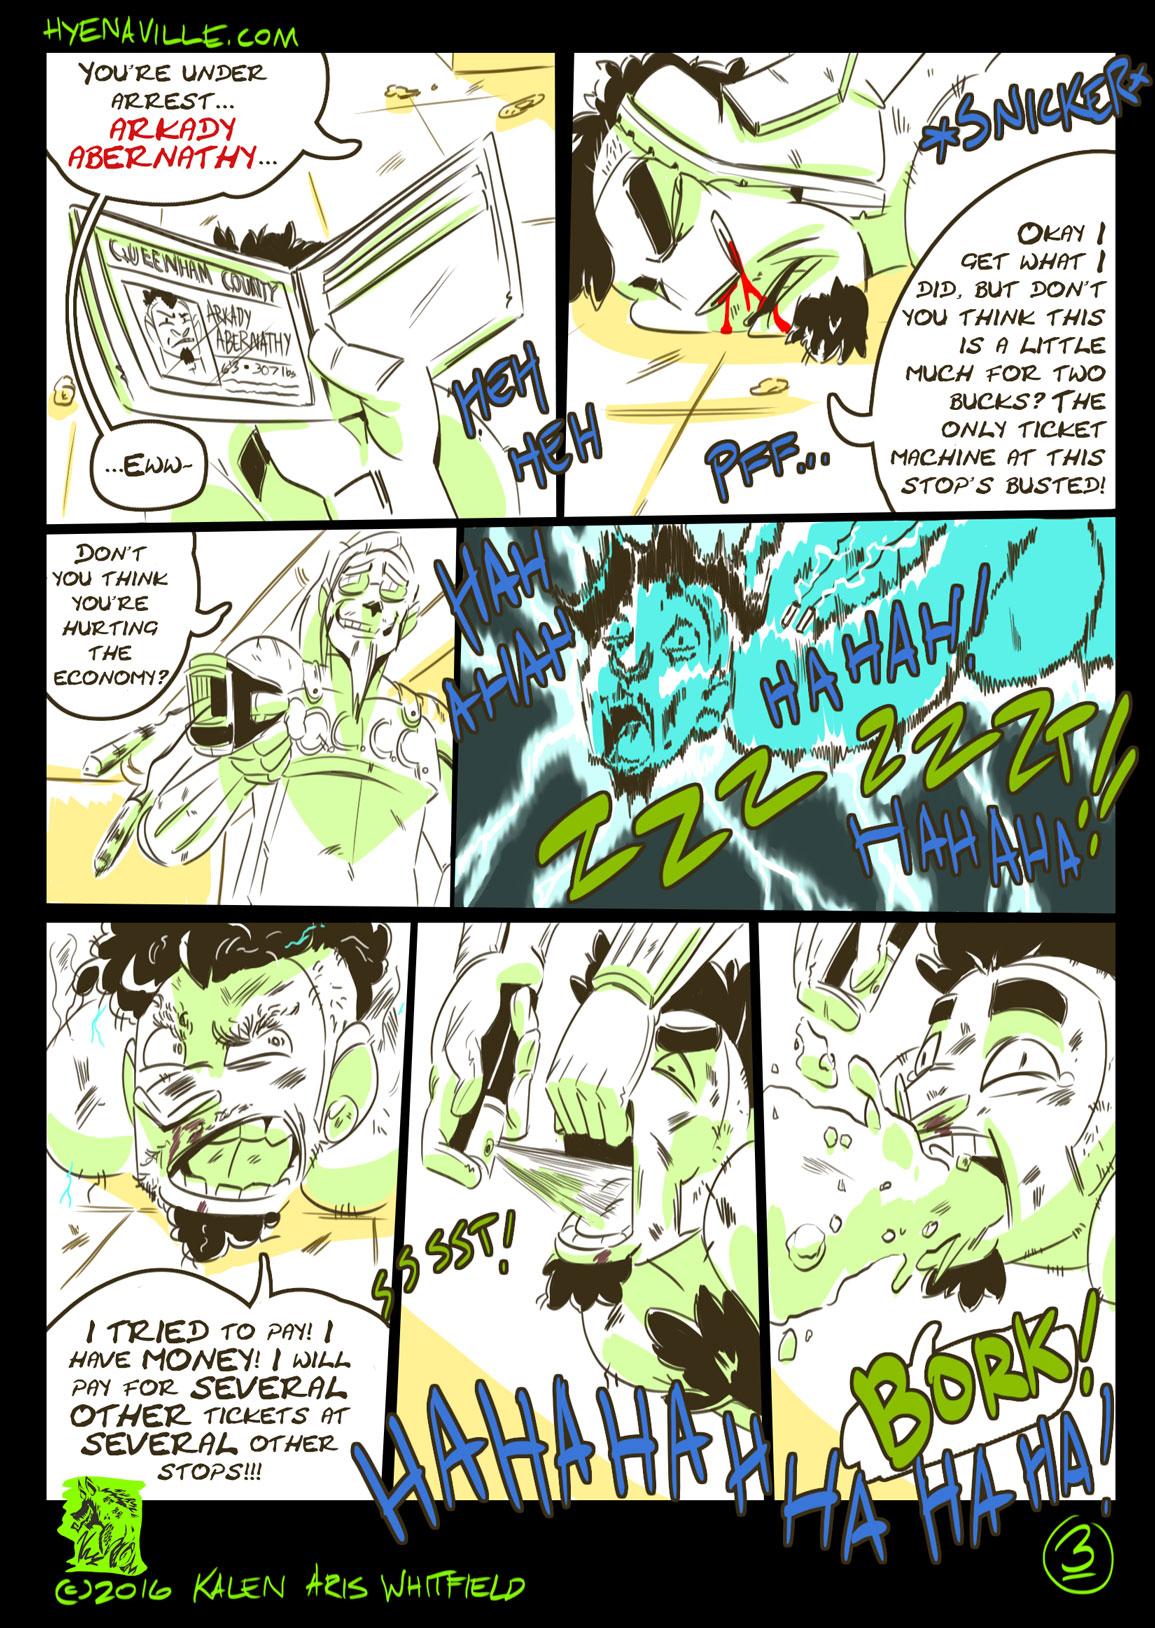 HYENAVILLE page 3